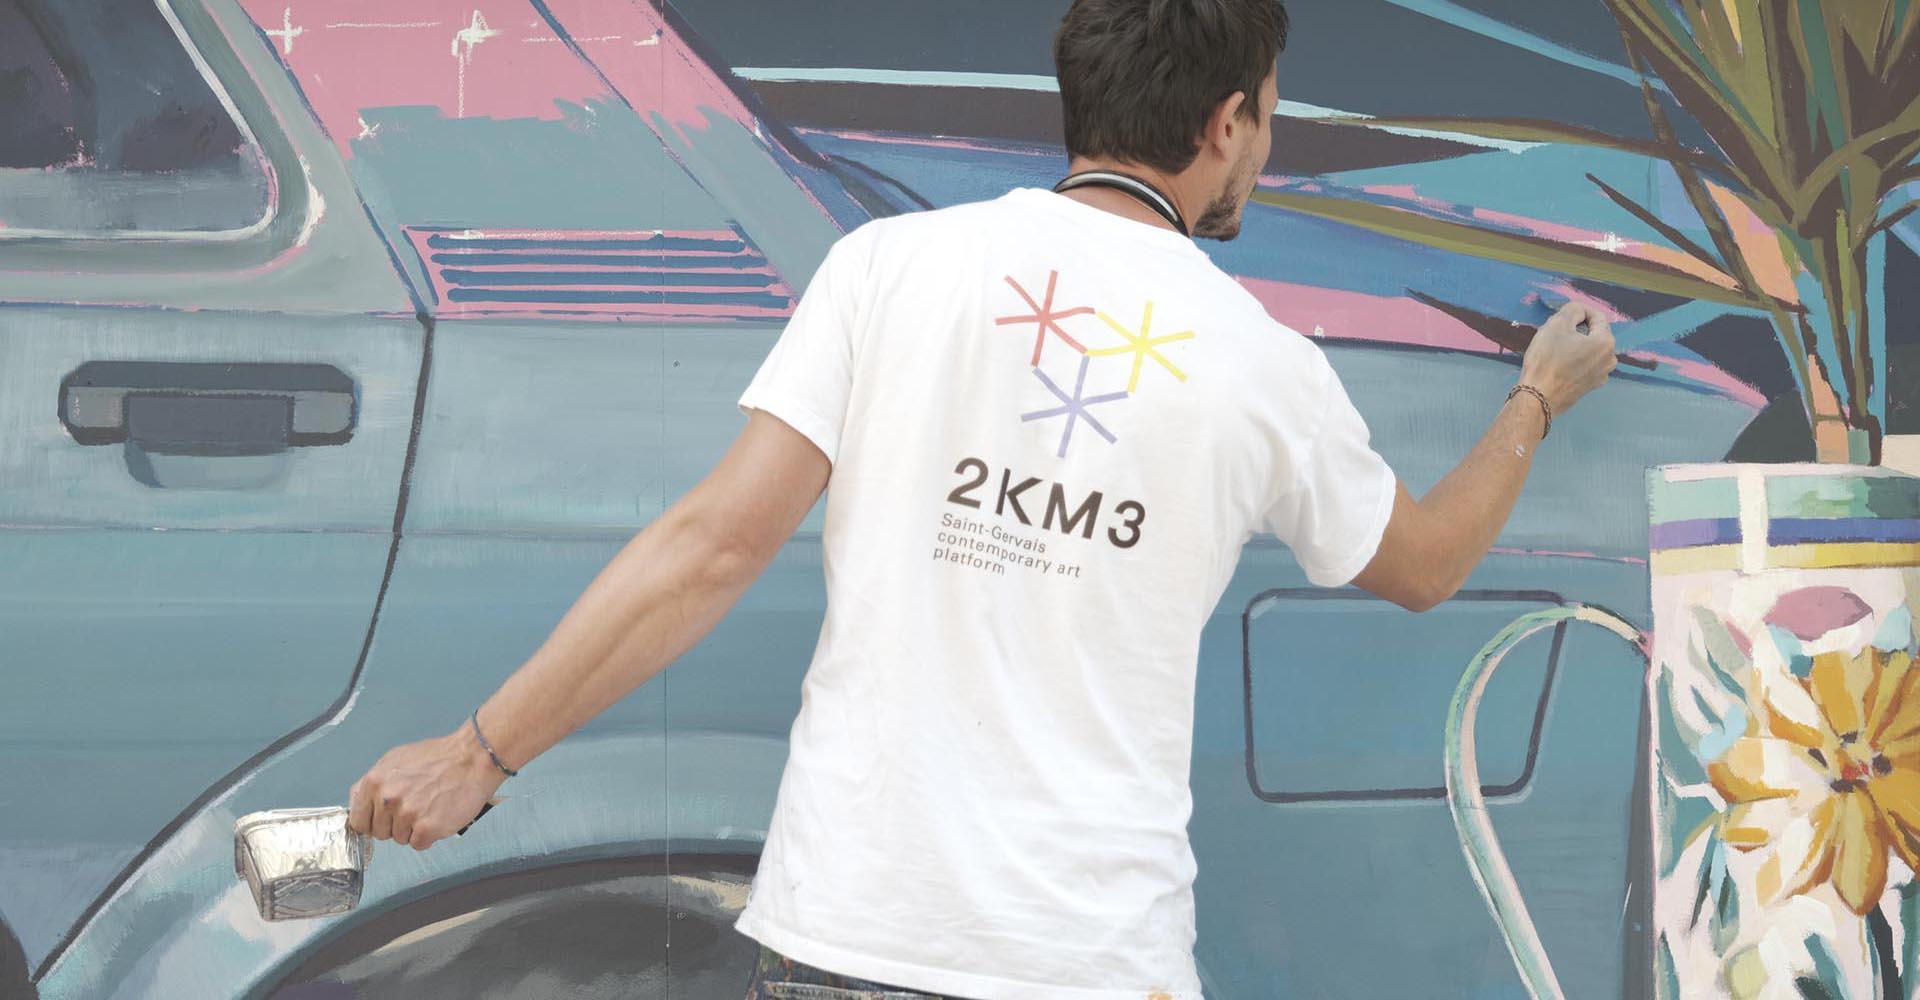 updaters-association-graffiti-le-mur-biarritz